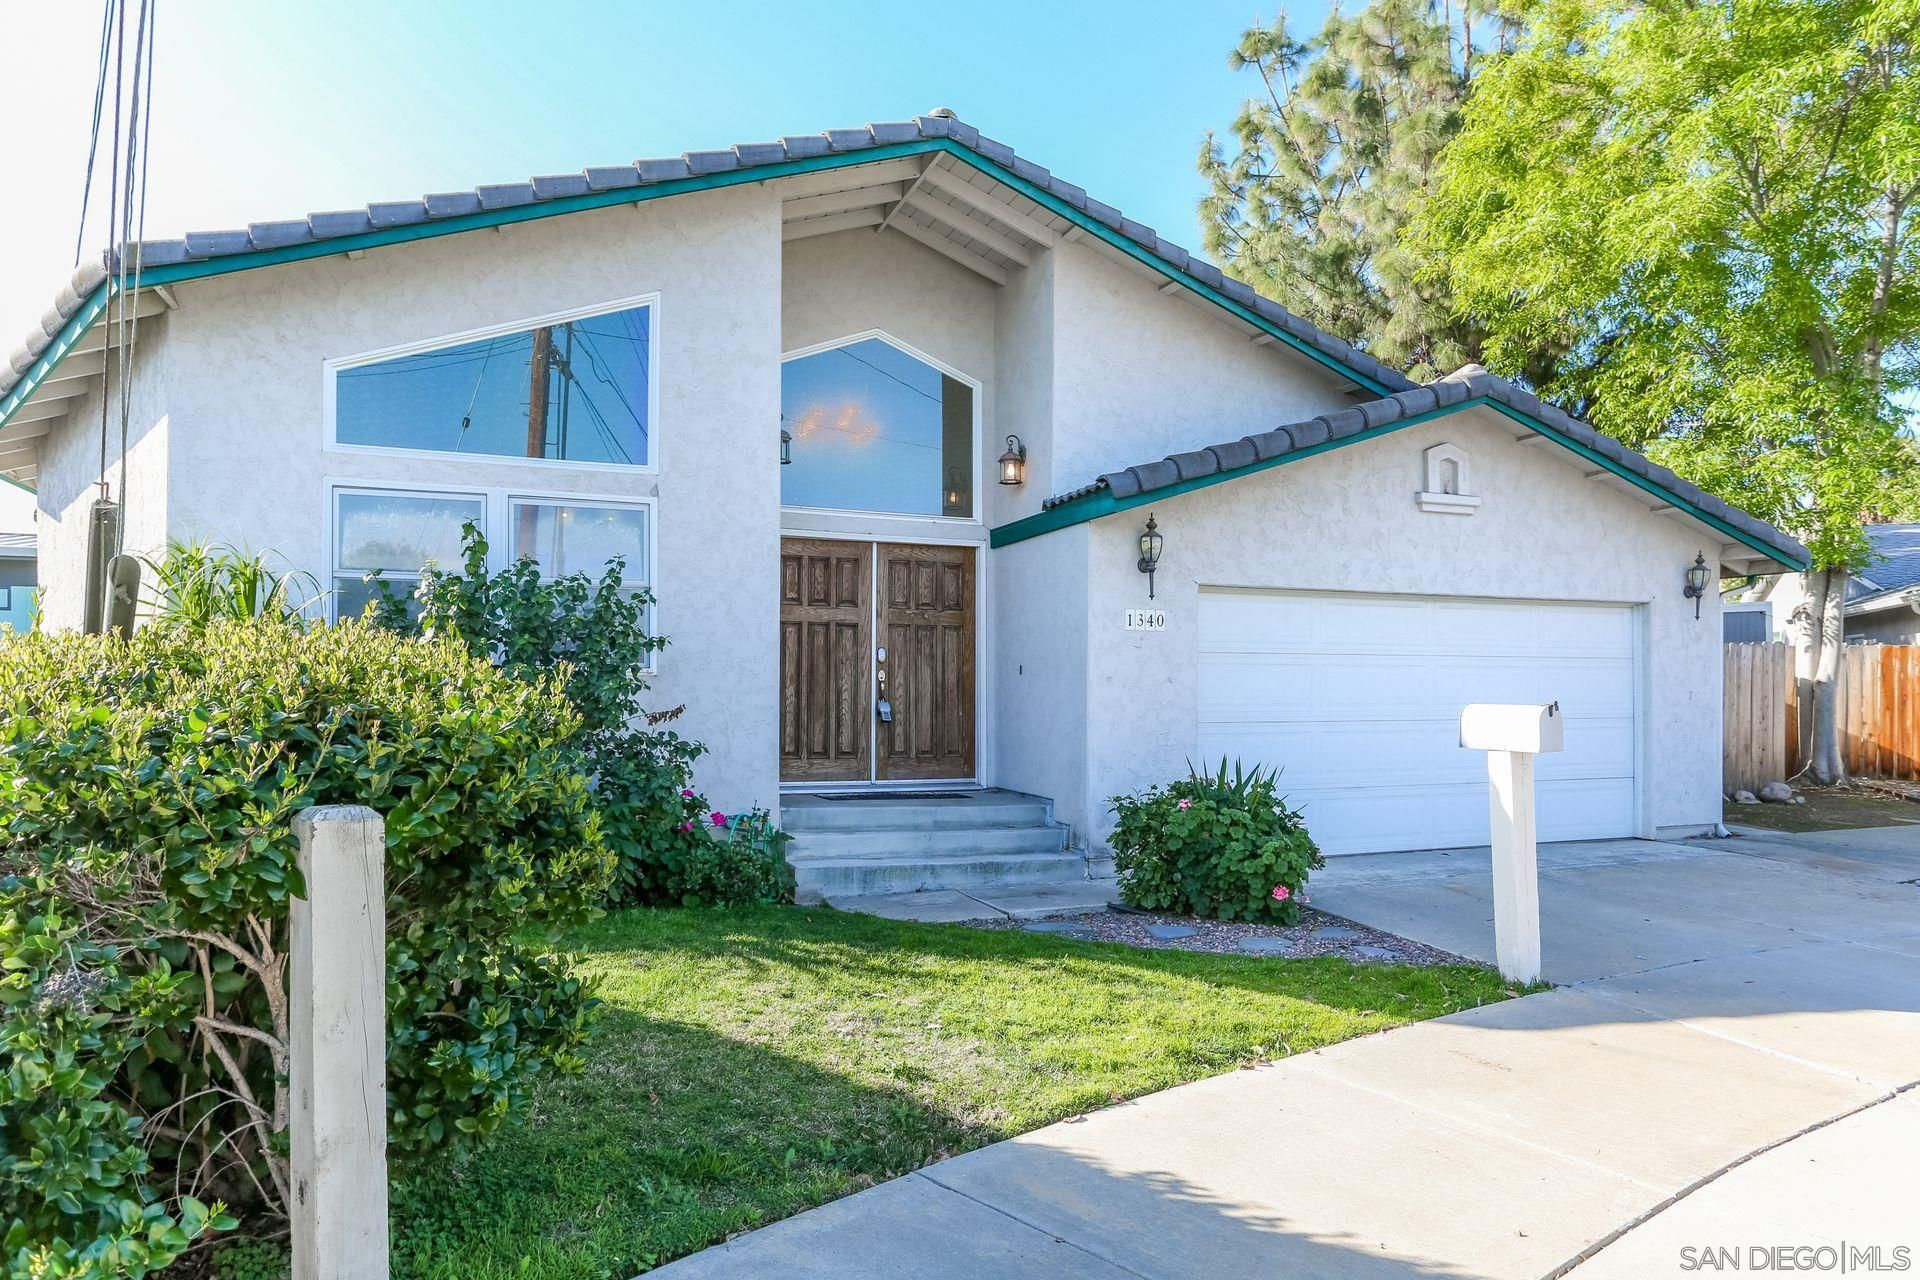 Main Photo: EL CAJON House for sale : 3 bedrooms : 1340 Bluebird St